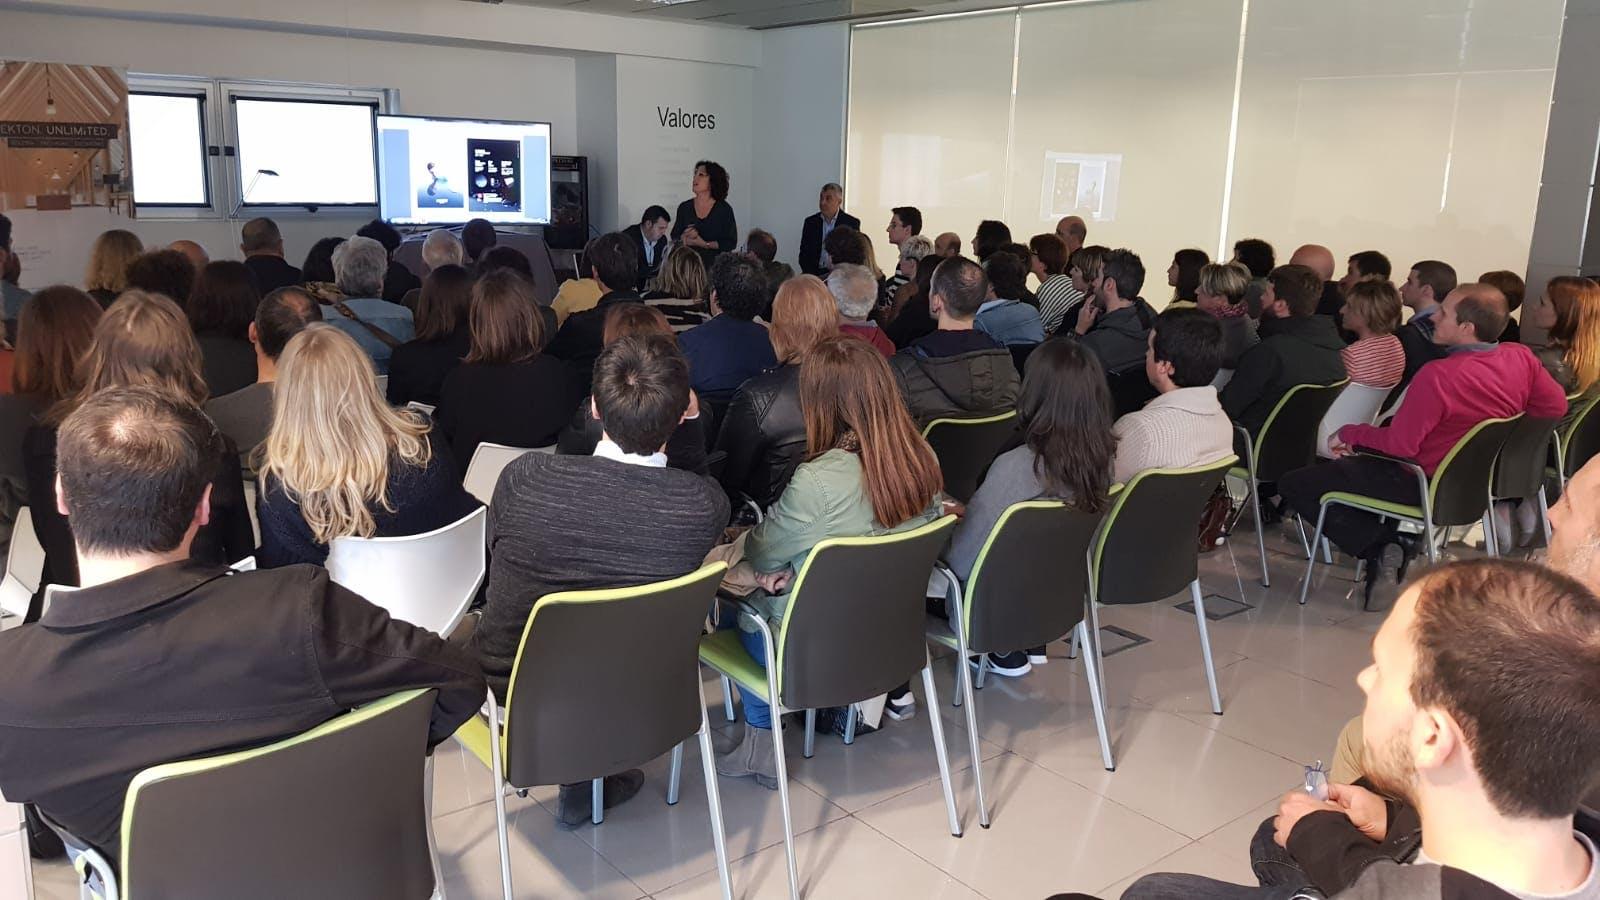 Image of Aula Cosentino San Sebastian Center 1 in Cosentino brings together more than 2,000 k&b professionals - Cosentino